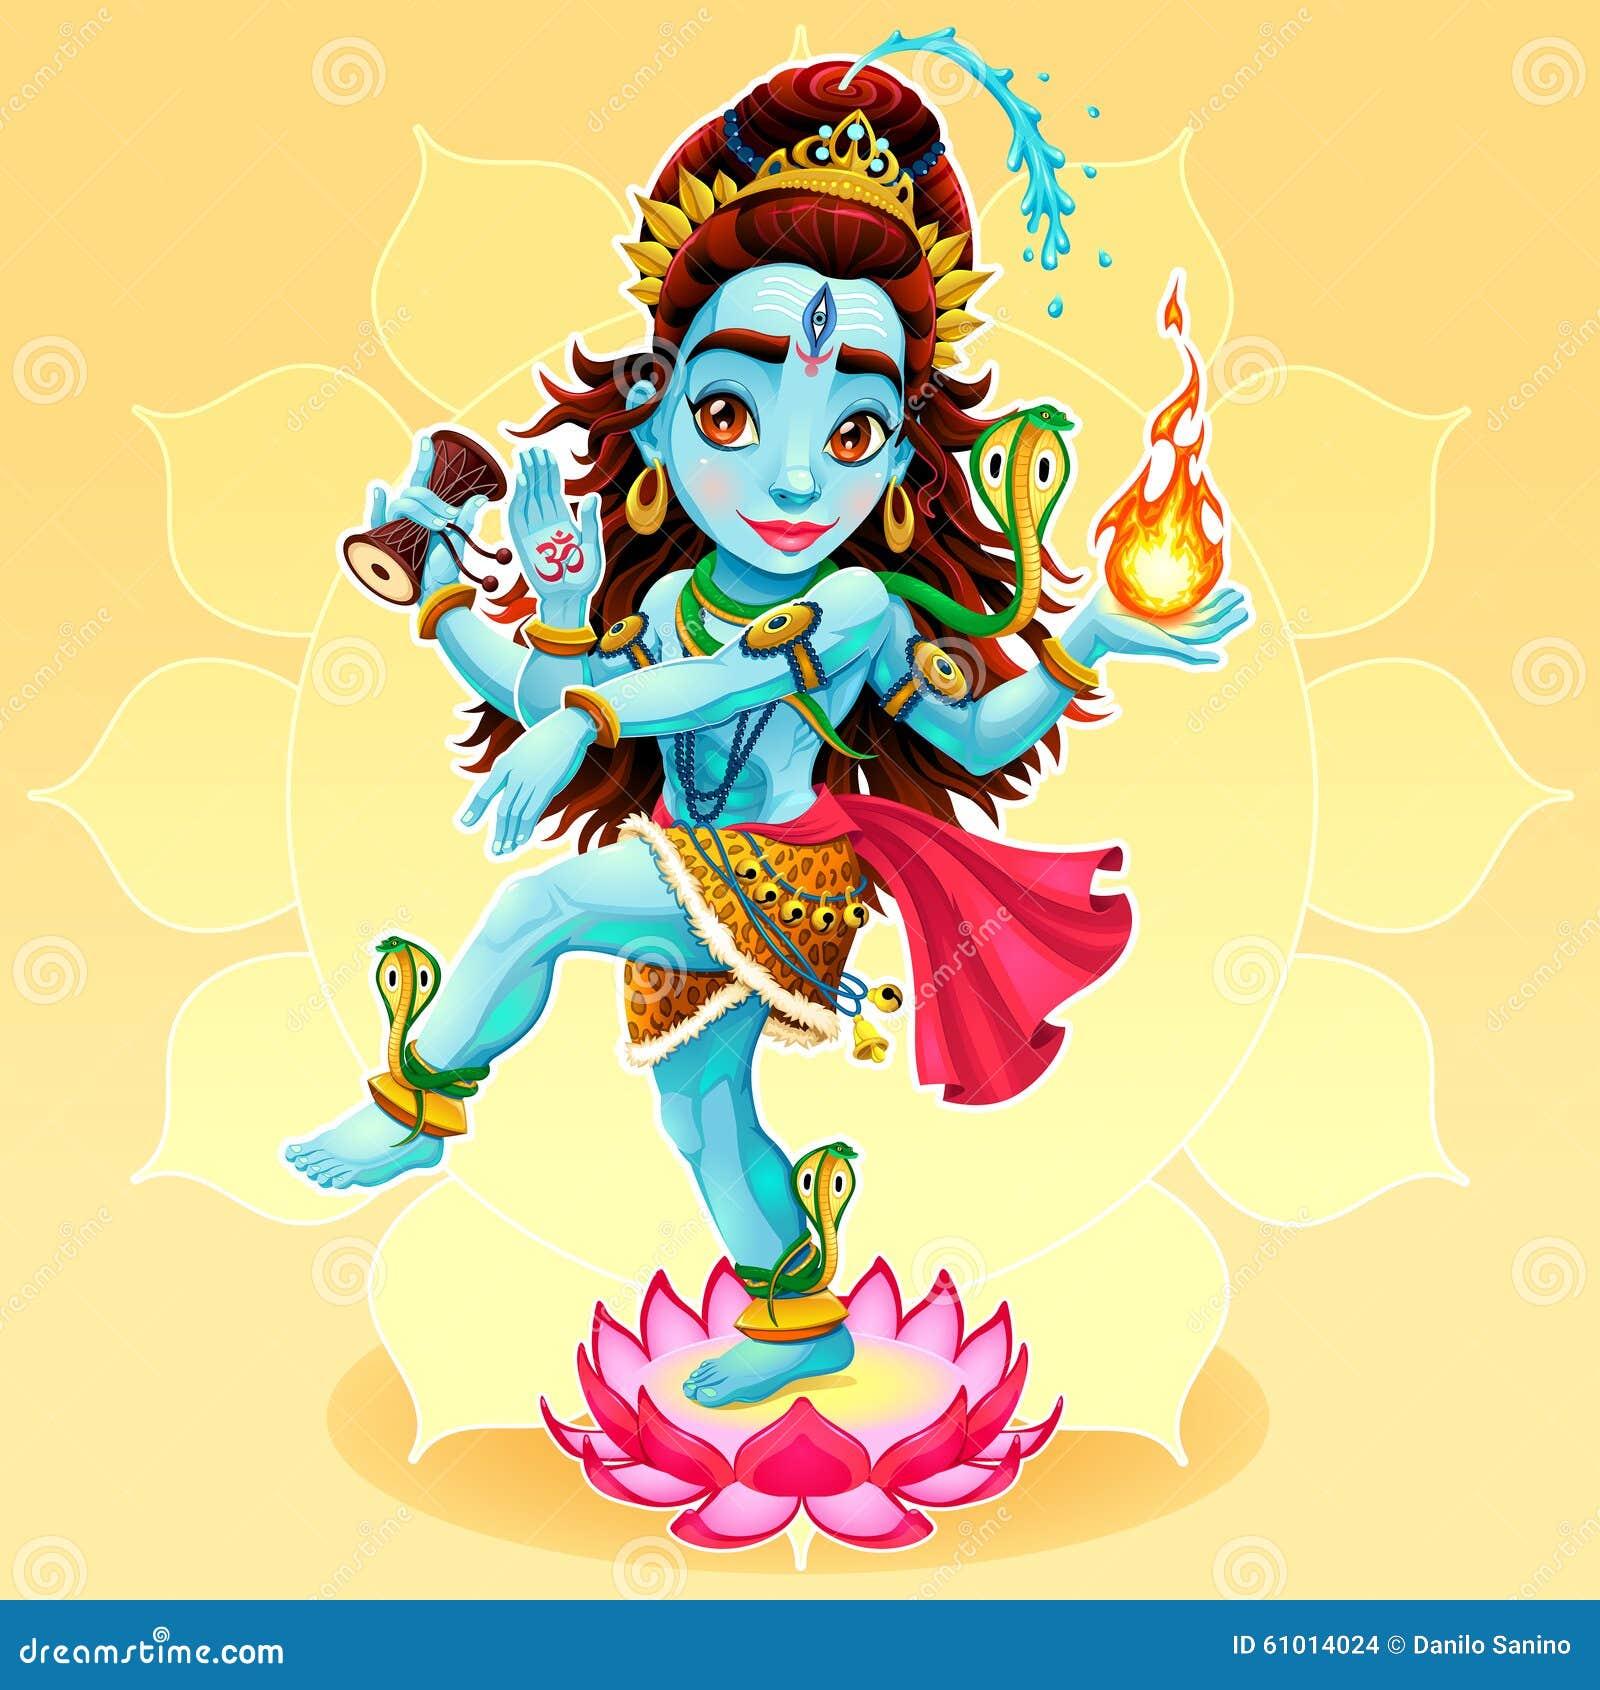 Dance Of Shiva Stock Vector - Image: 61014024